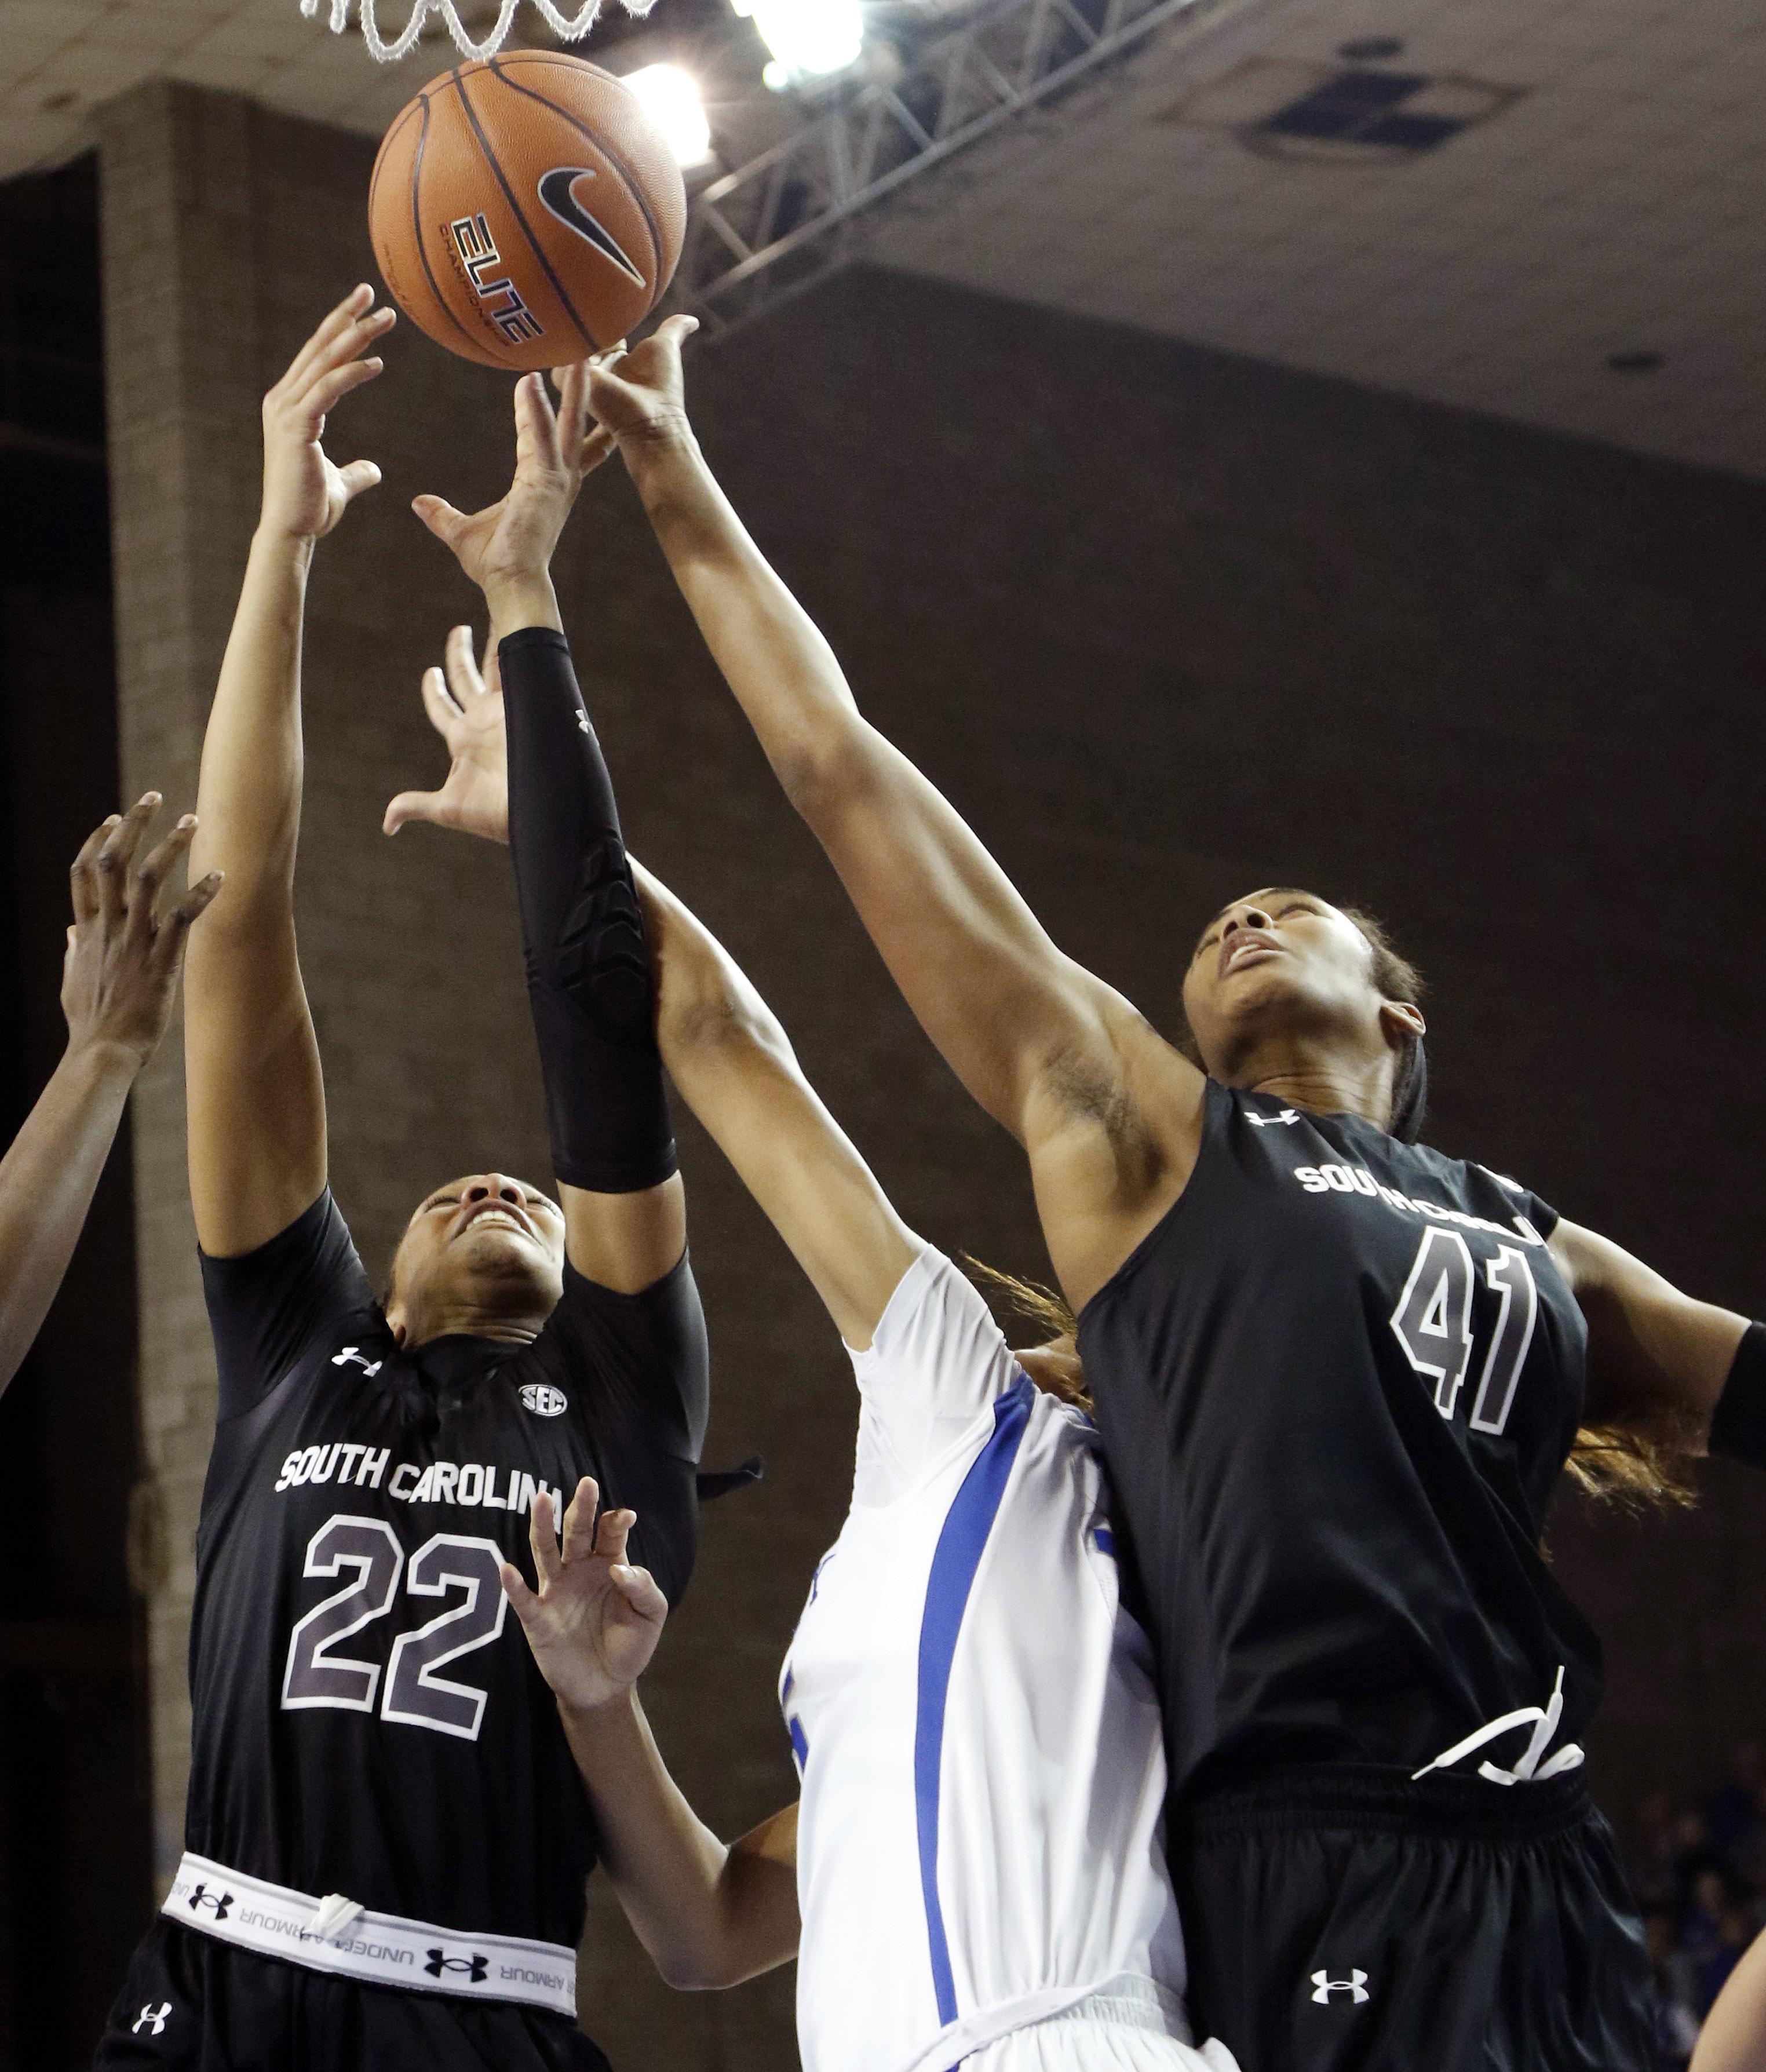 South Carolina's A'ja Wilson (22) and Alaina Coates (41) go for a rebound near Kentucky's Alexis Jennings during an NCAA college basketball game Thursday, Jan. 14, 2016, in Lexington, Ky. (AP Photo/James Crisp)